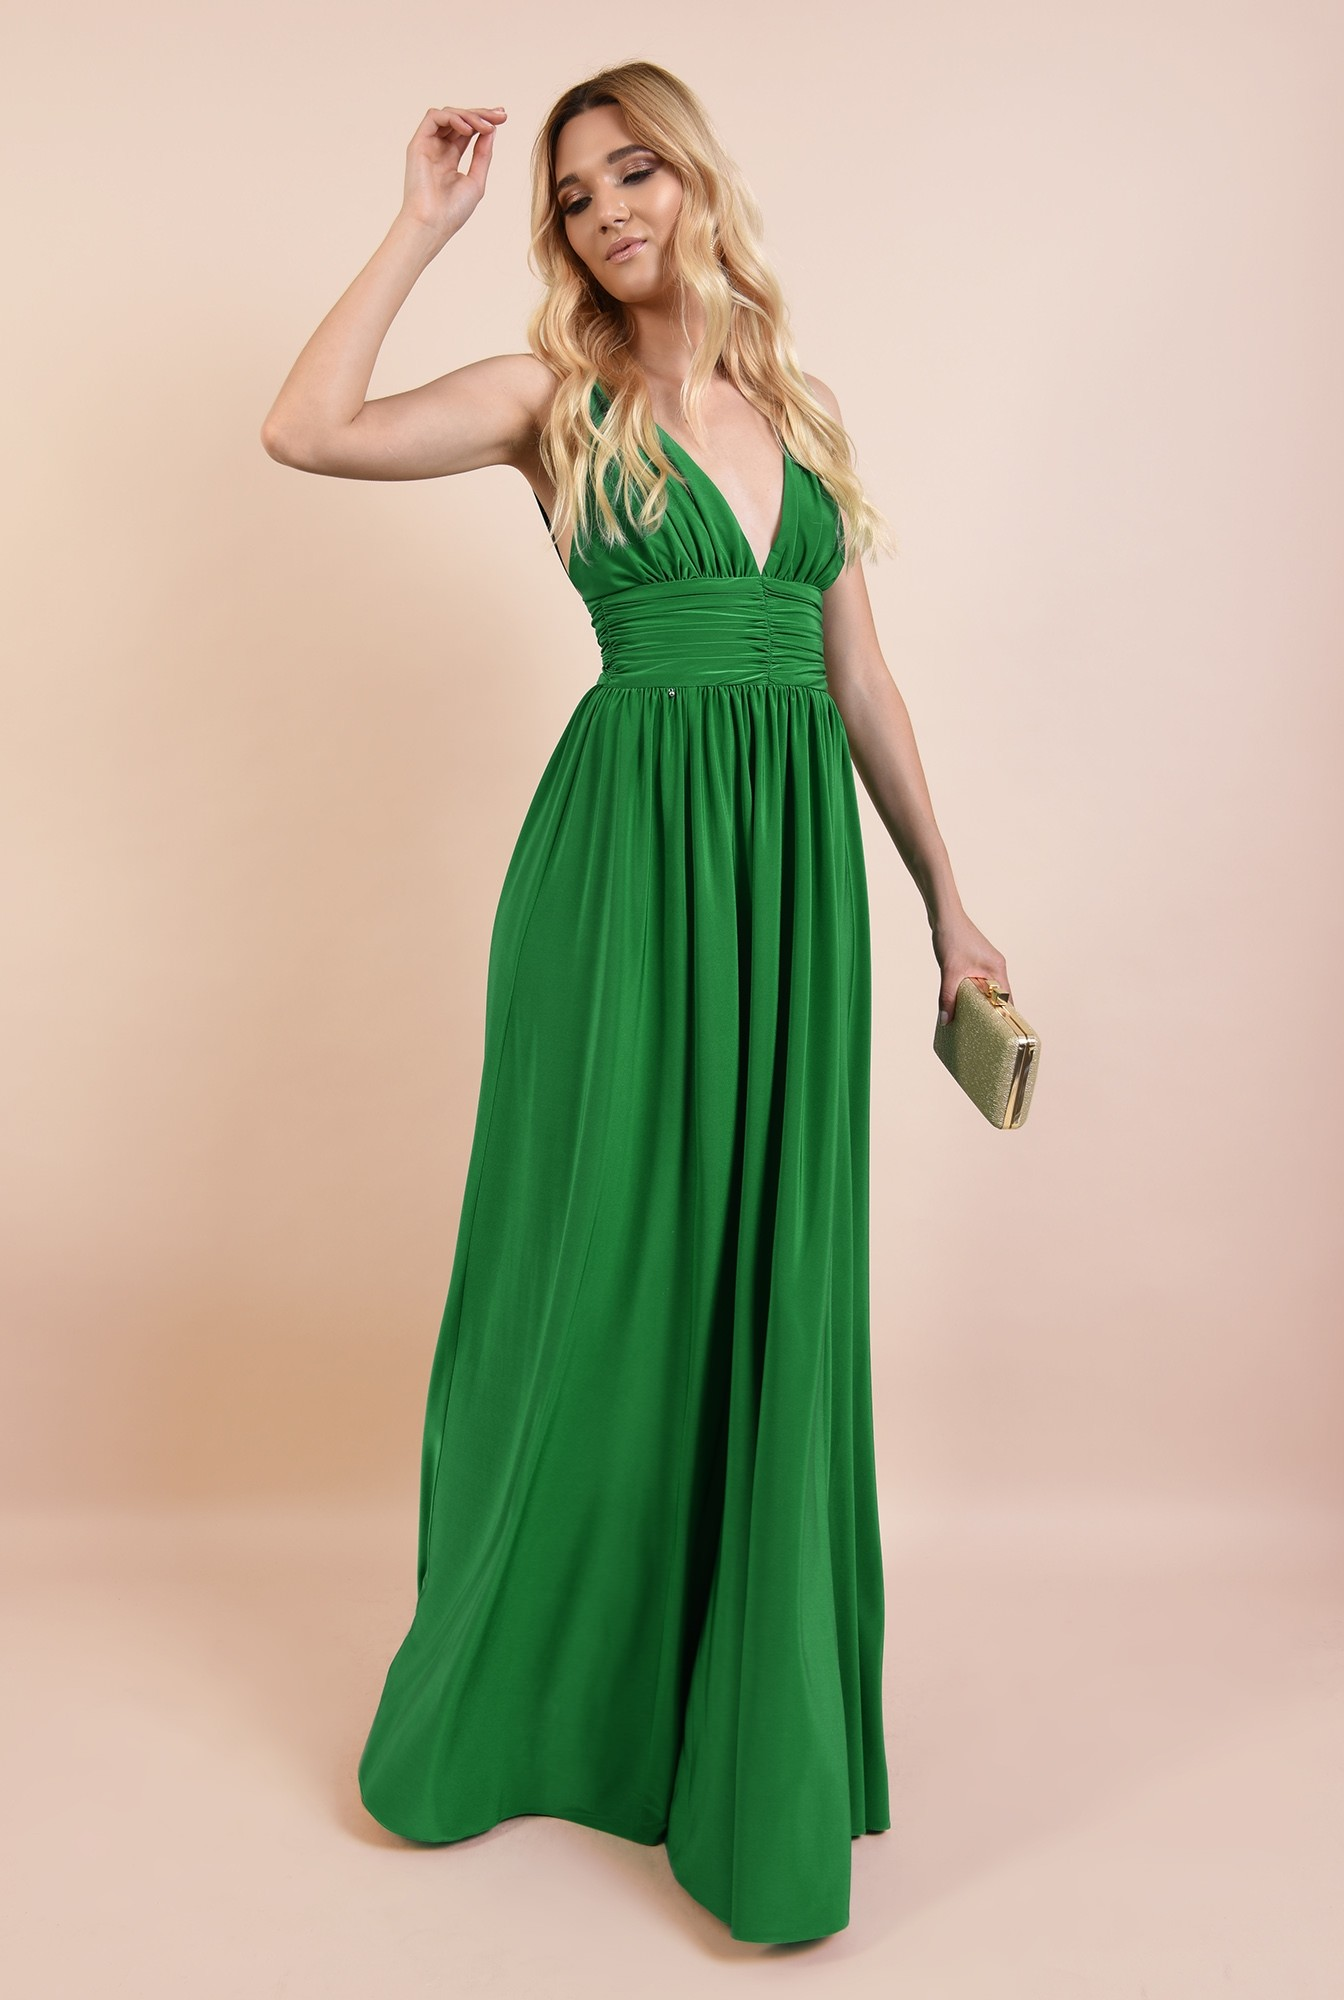 0 - rochie de ocazie, verde, din lycra, cu anchior adanc, spate gol, Poema